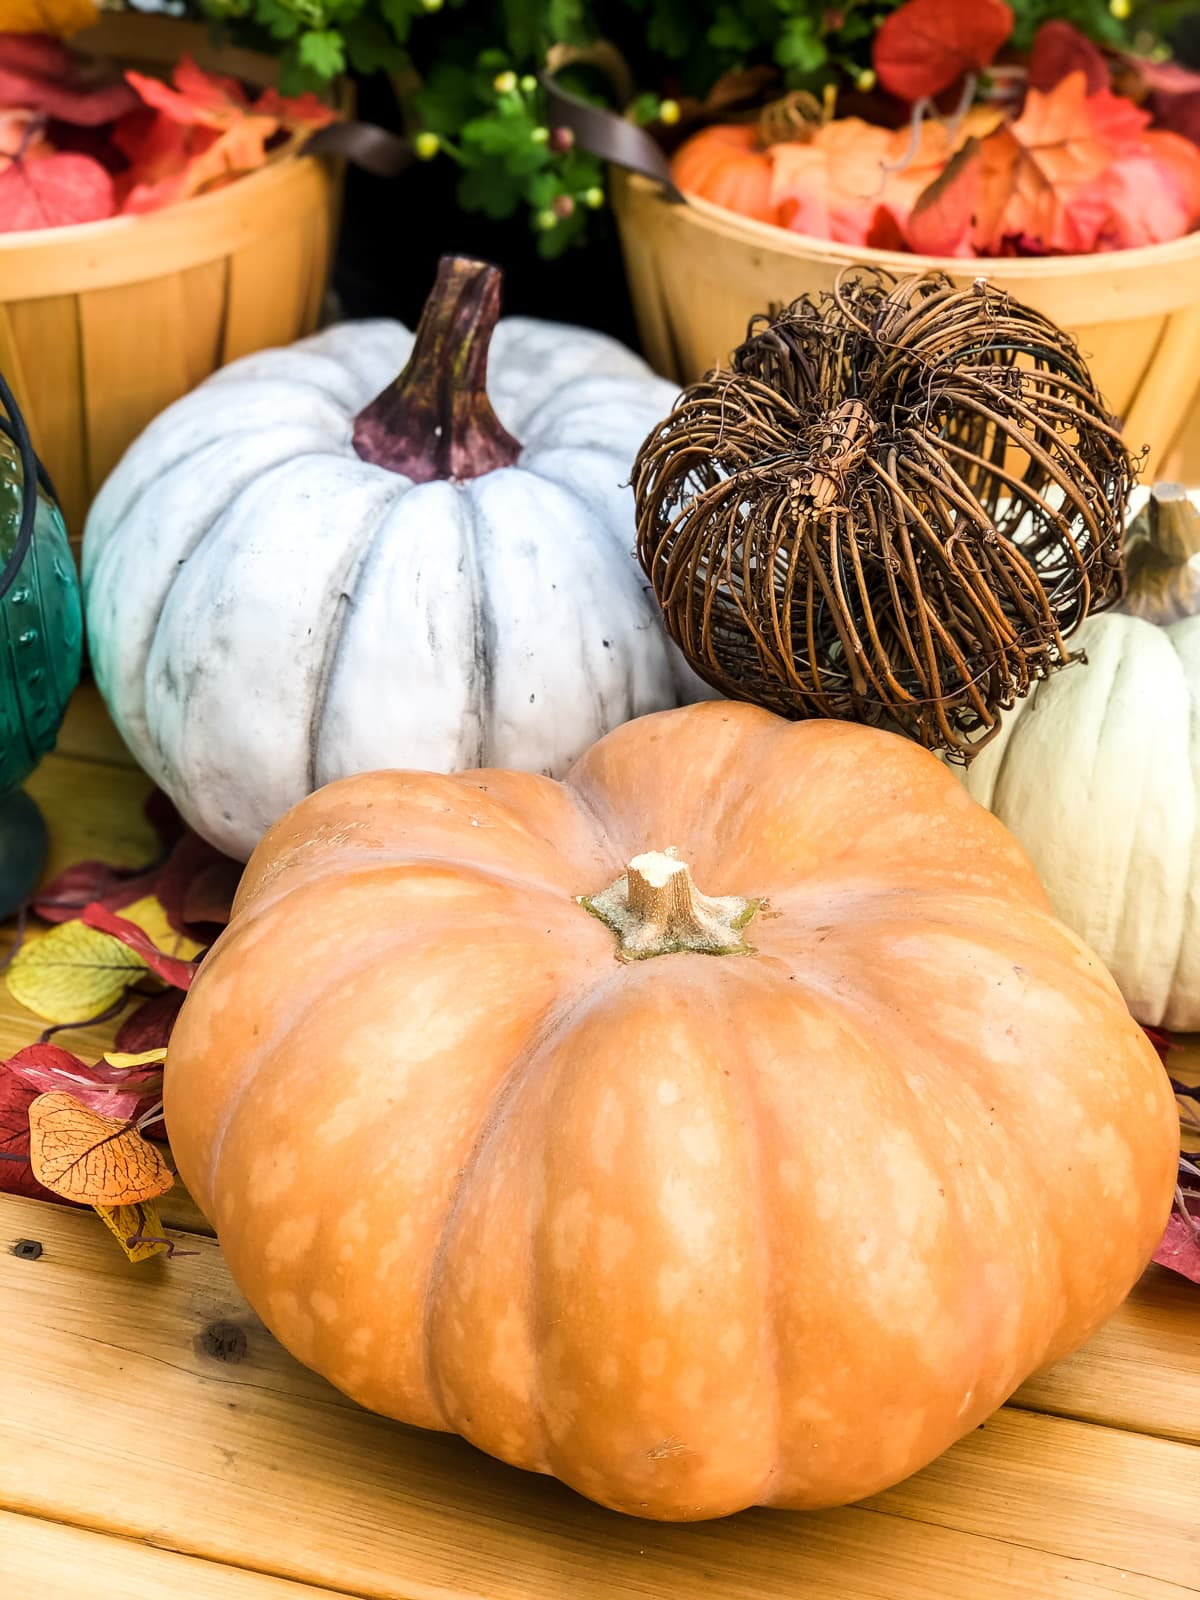 An arrangement of white and orange pumpkins